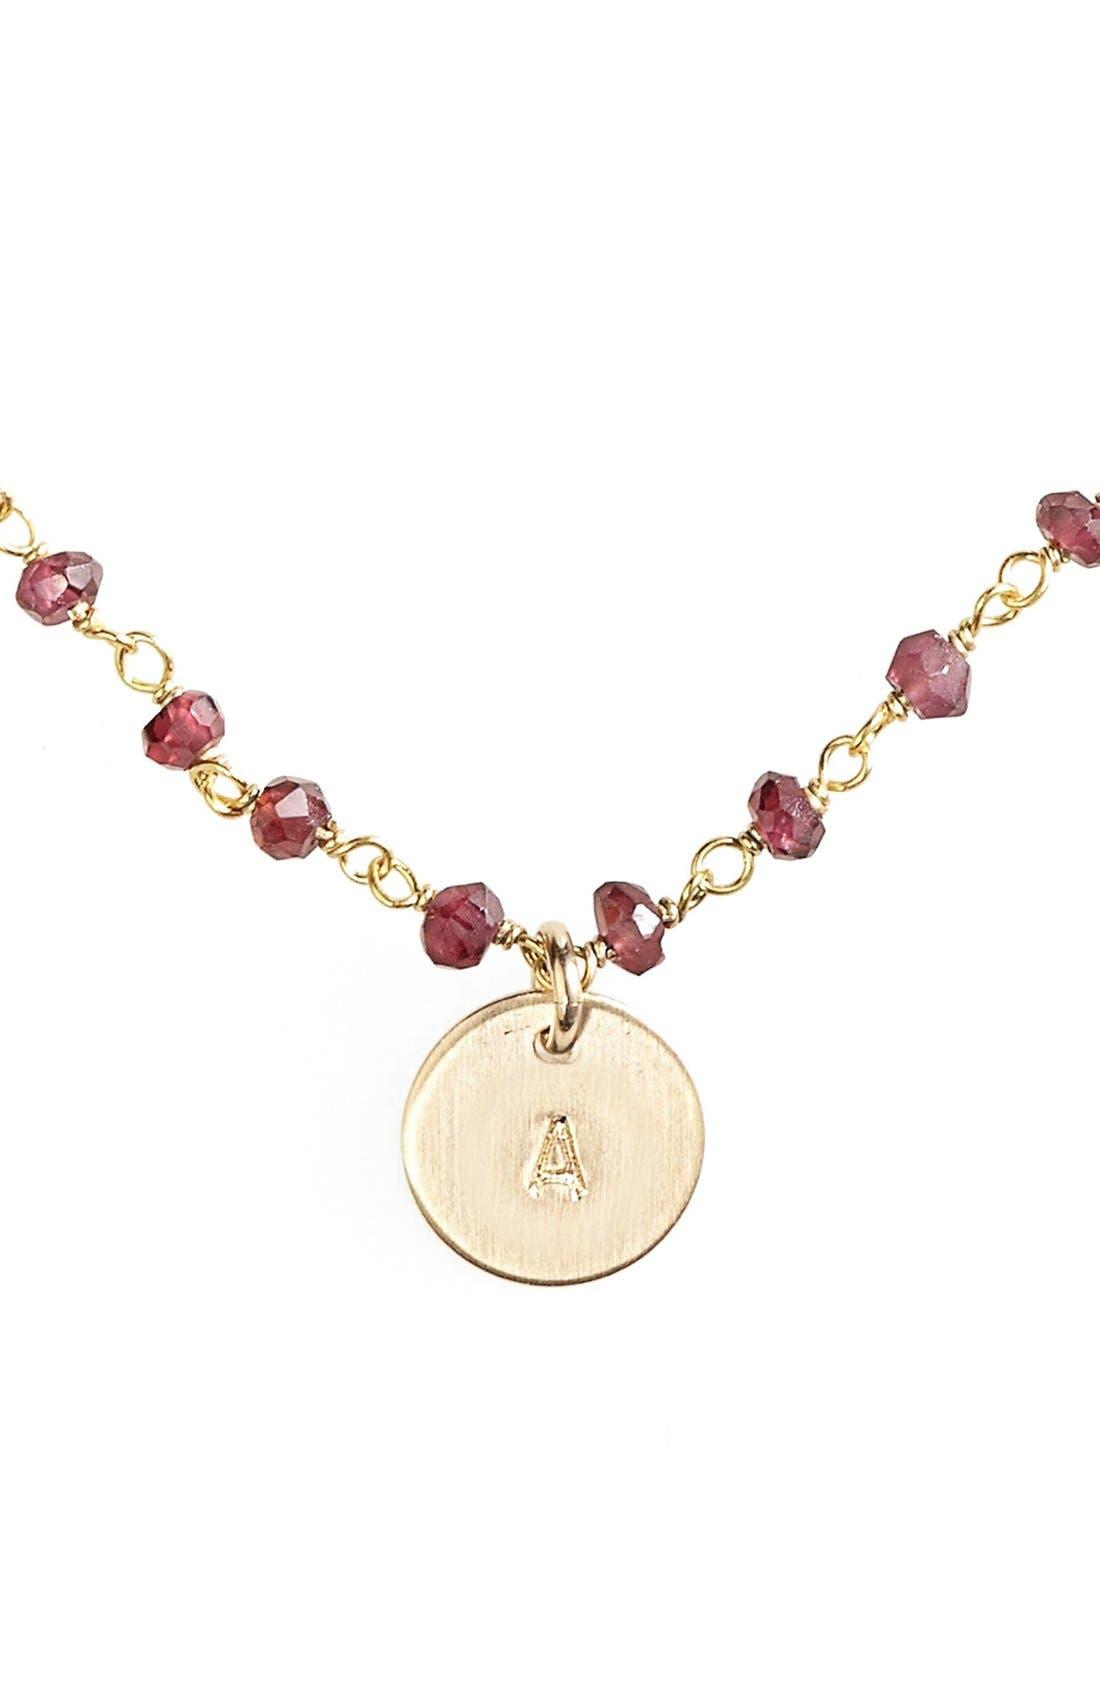 14k-Gold Fill Mini Initial Disc Garnet Chain Necklace,                             Main thumbnail 1, color,                             710